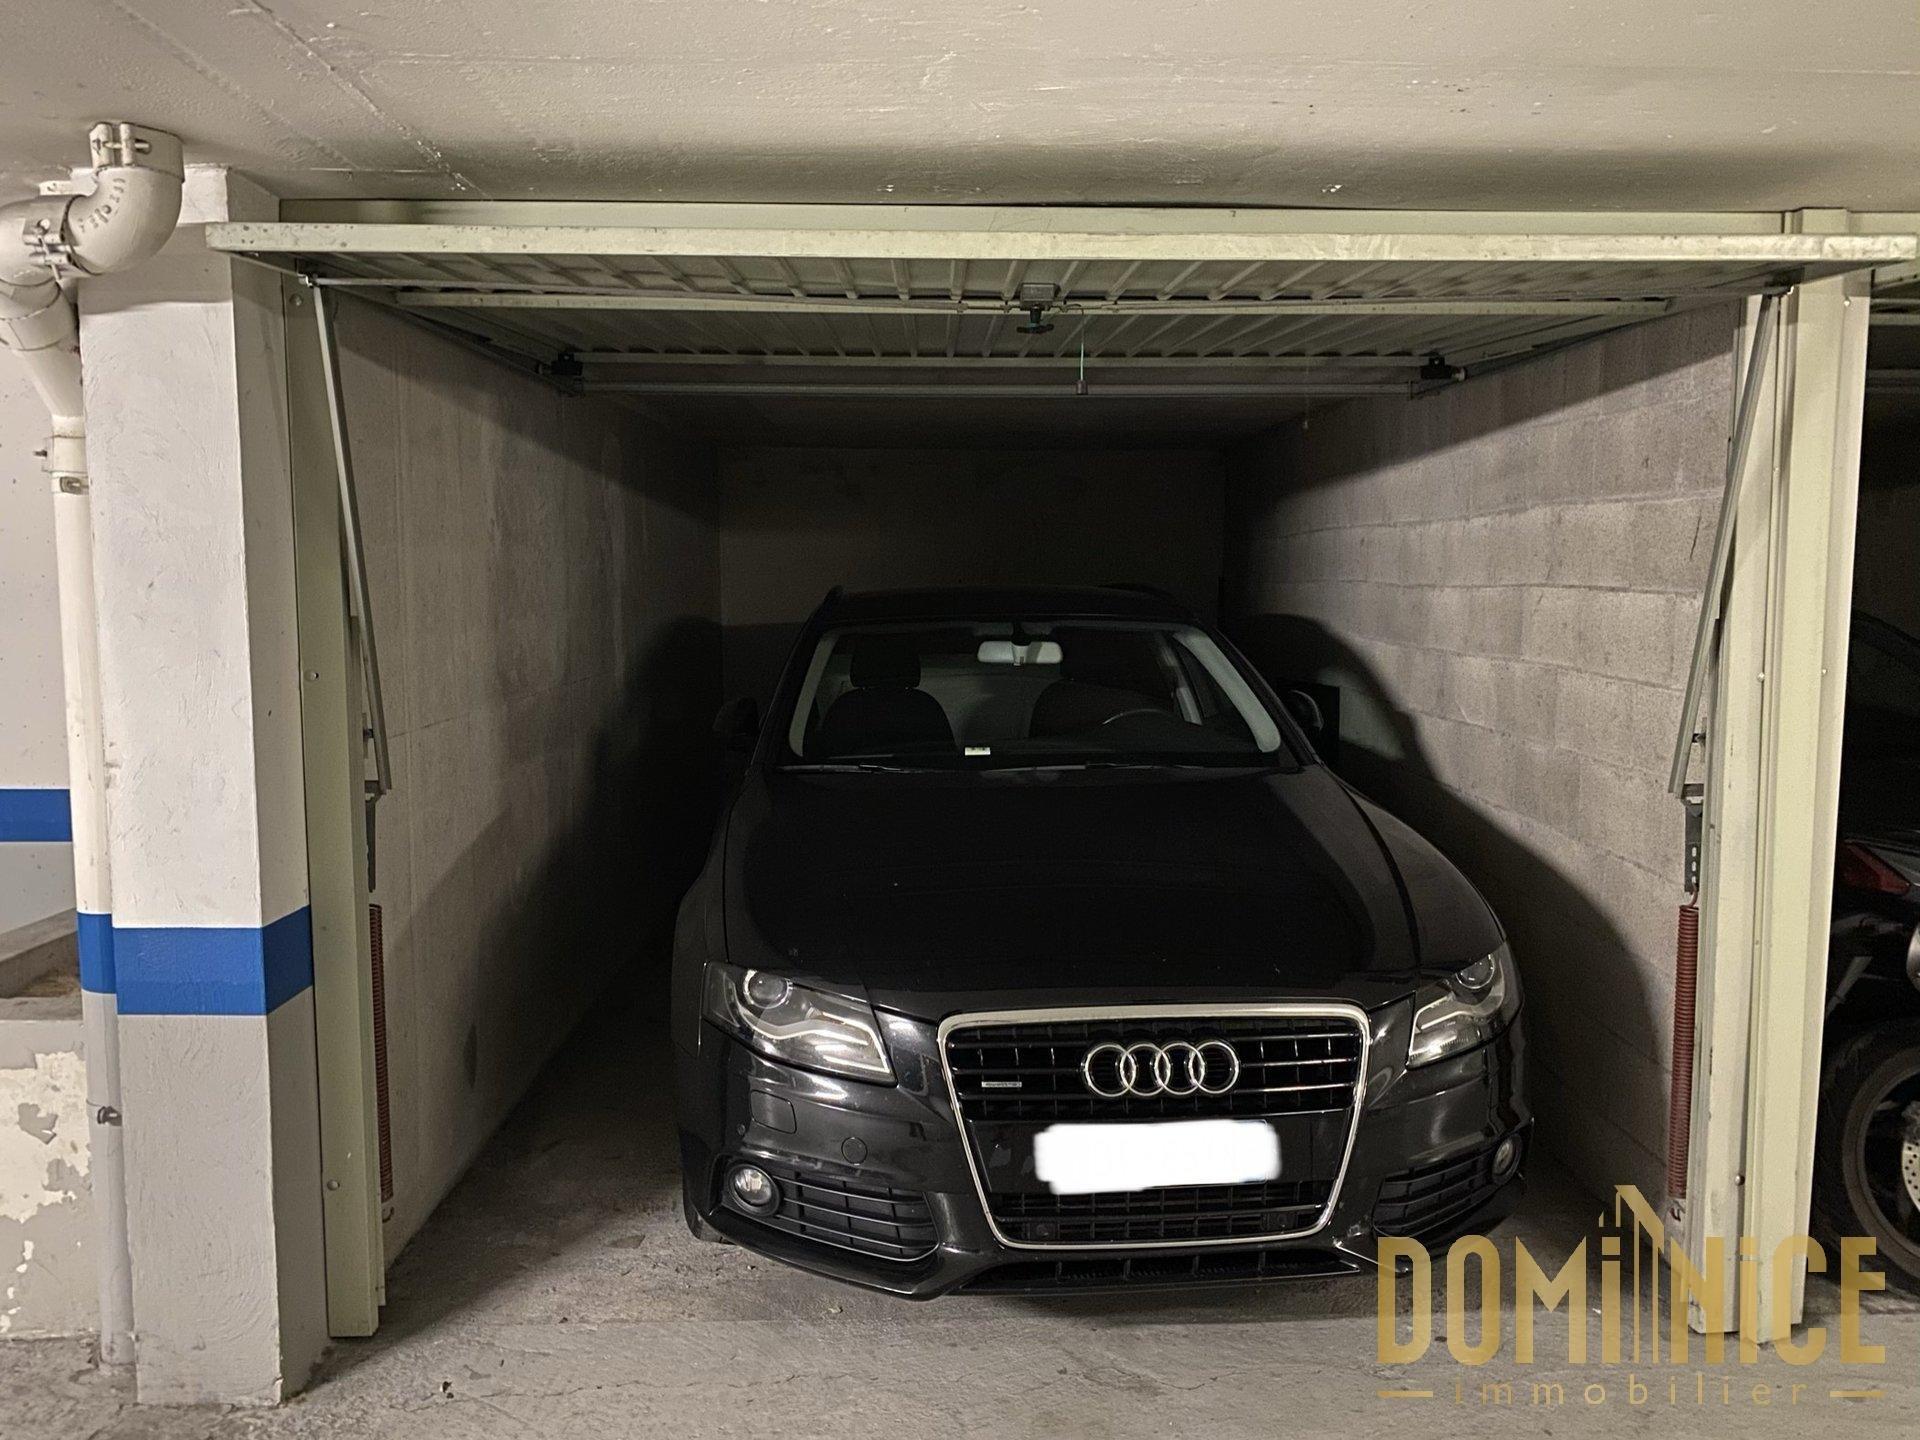 WILSON : Garage, immeuble standing sécurisé gardien